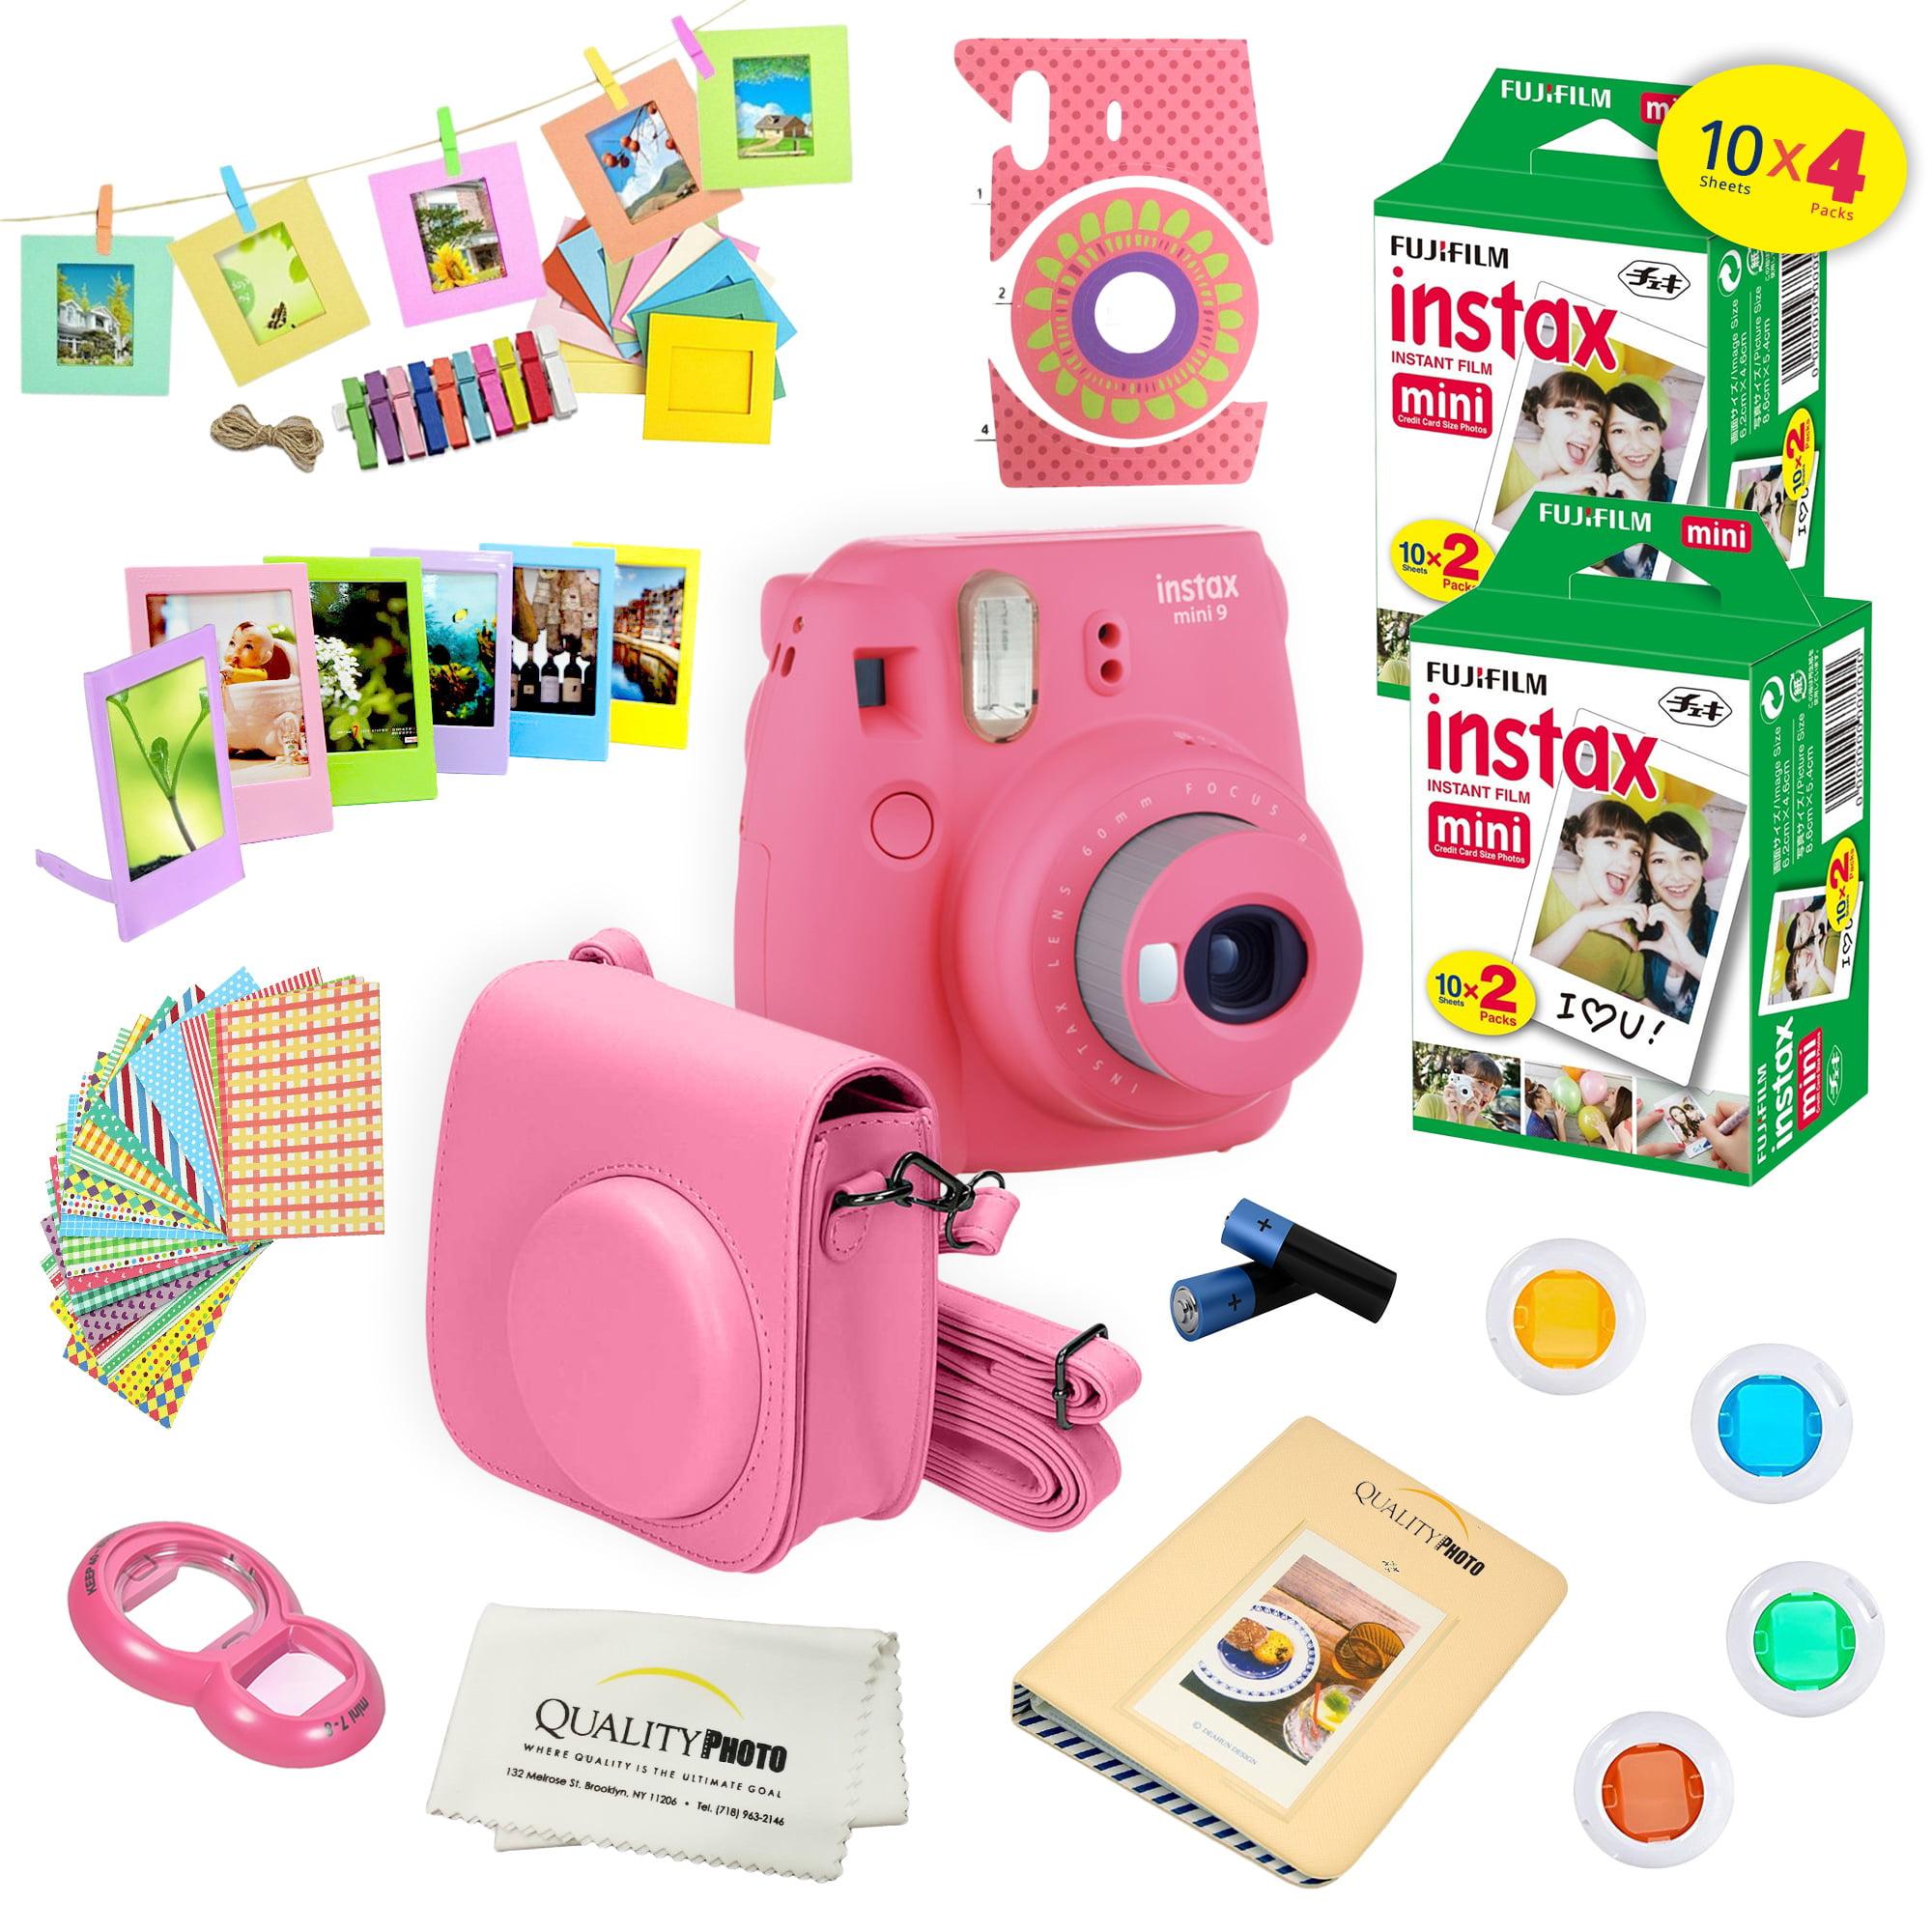 Fujifilm Instax Mini 9 Camera Pink + 15 PC Accessory Kit for Fujifilm instax mini 9 Instant Camera Includes: 40 Fuji Instax Films + Case + Album + Colored lenses + Assorted color/Style frames + MORE